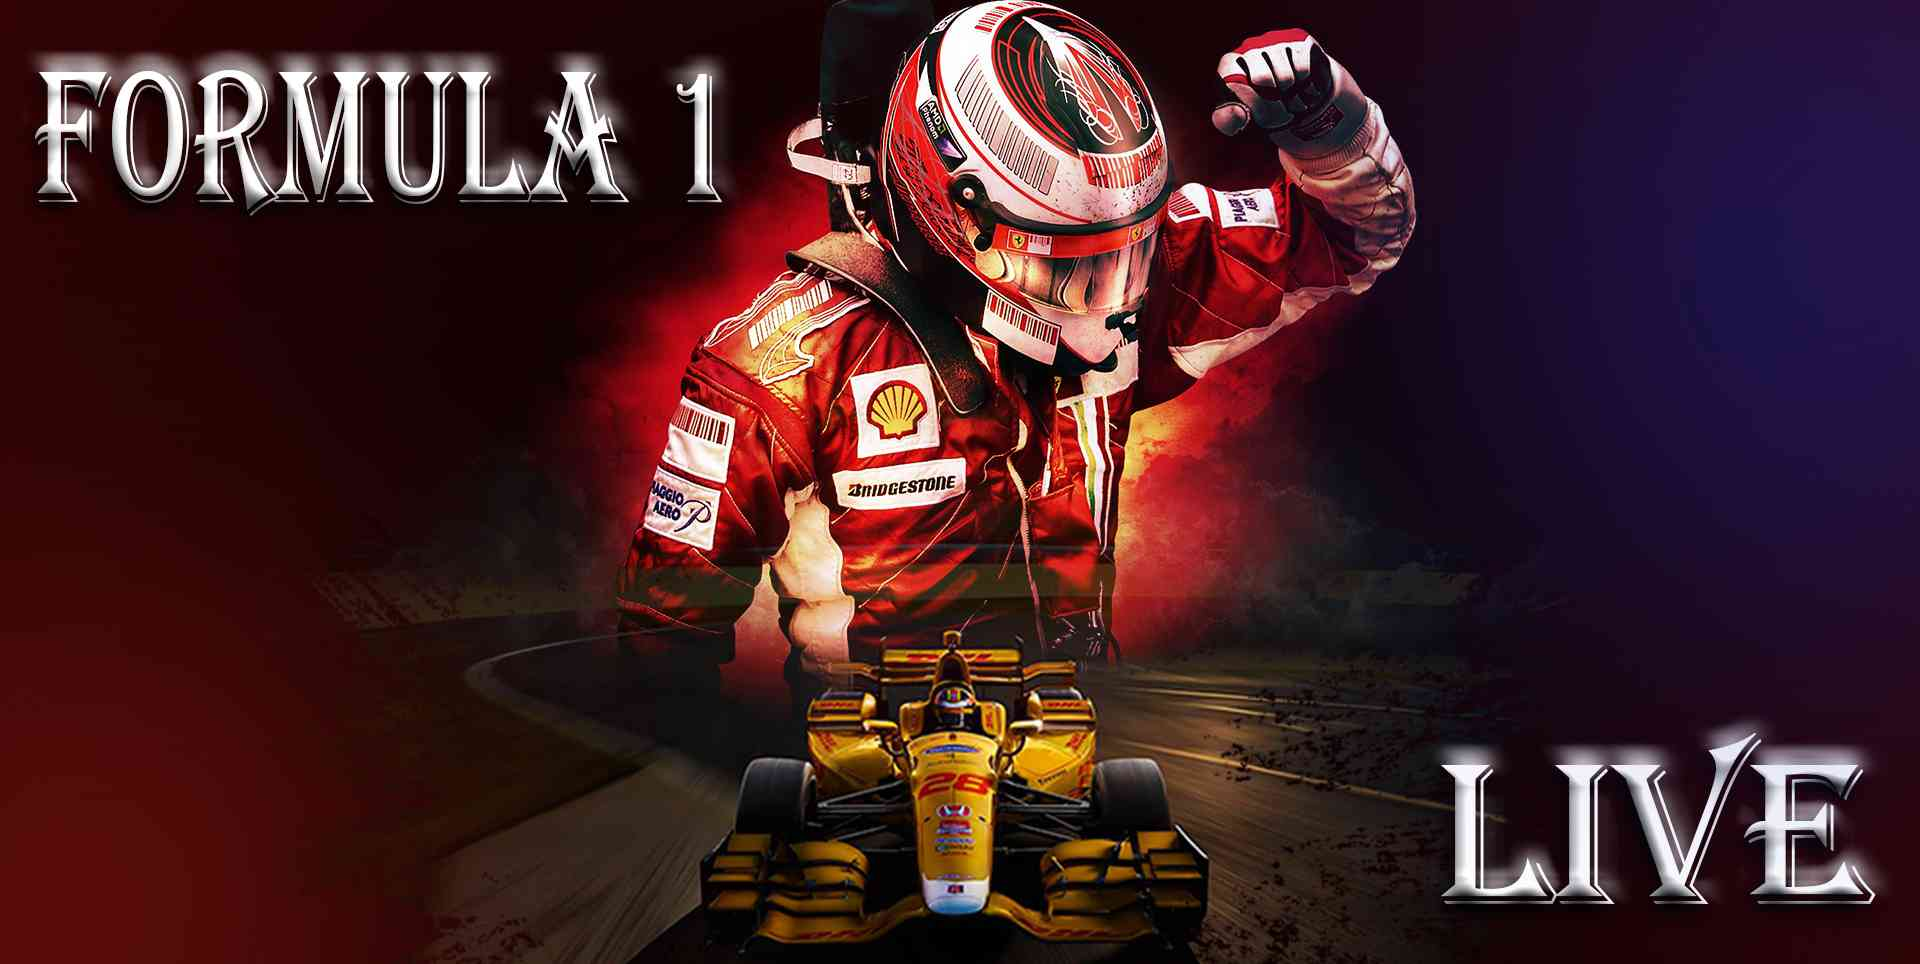 formula-1-live-stream-usa-gp-2015